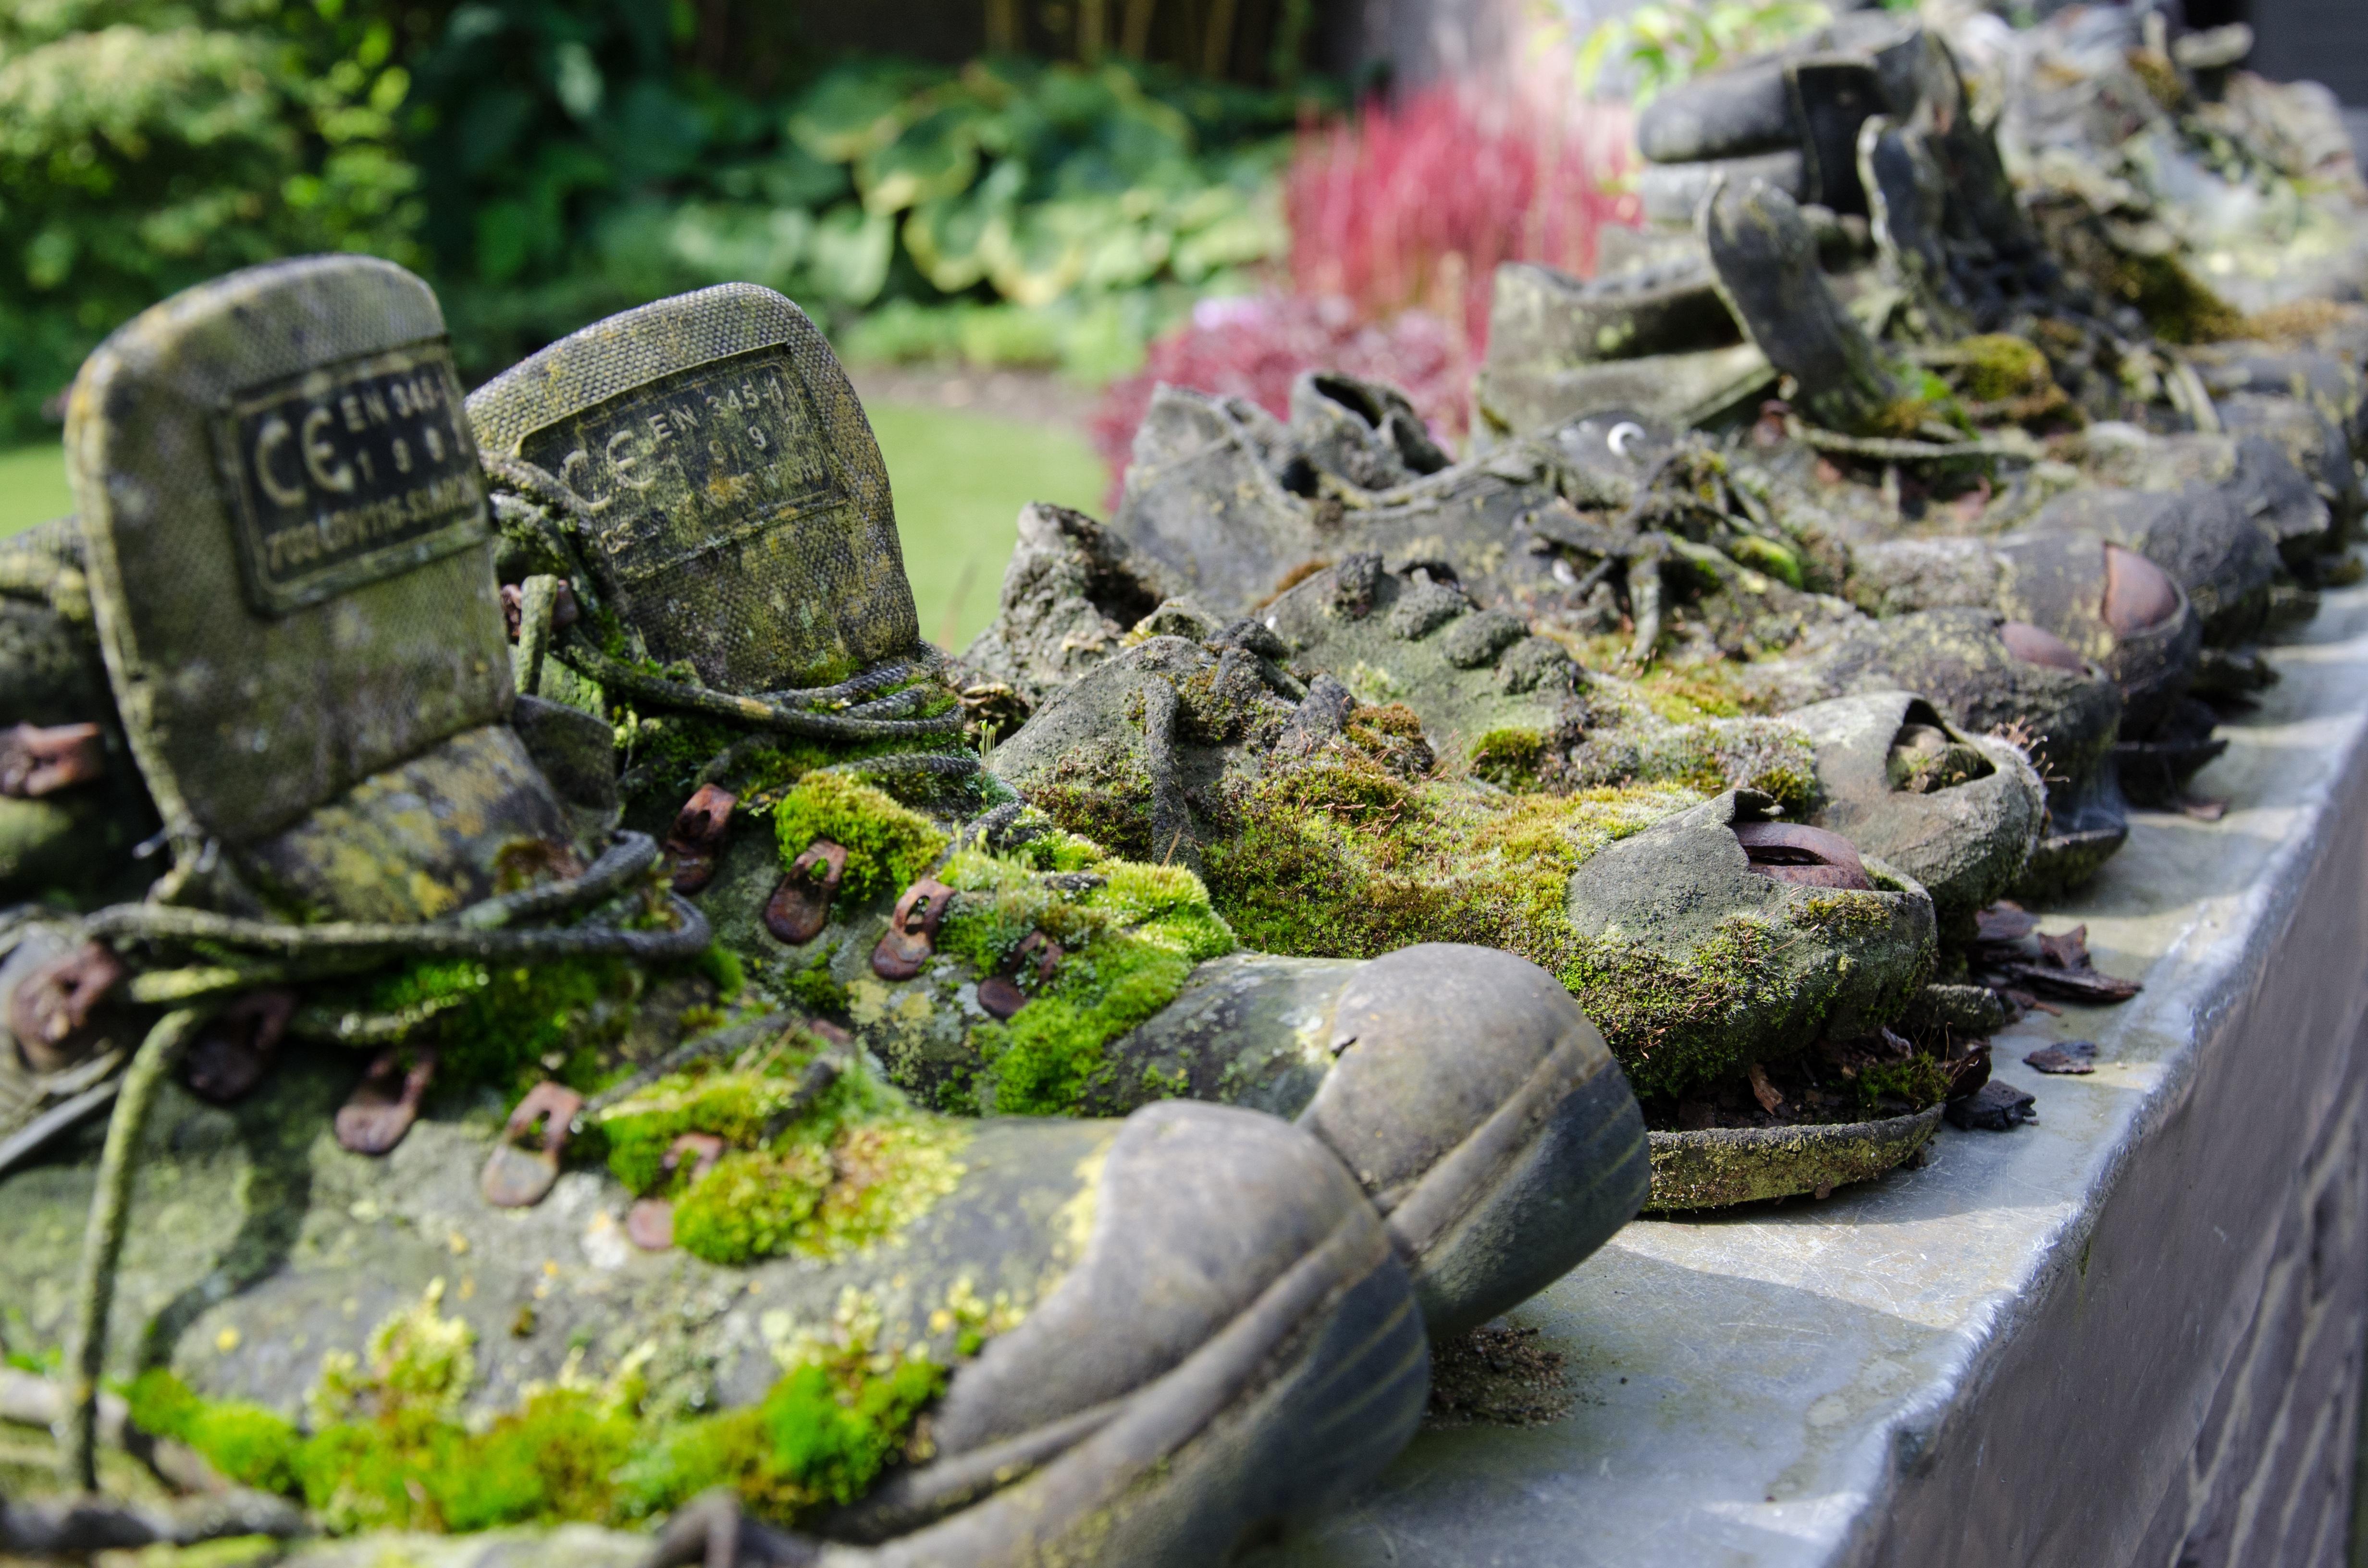 4e2f19fabc5354 rock plant flower moss garden walking shoes water feature appeltern work  shoes